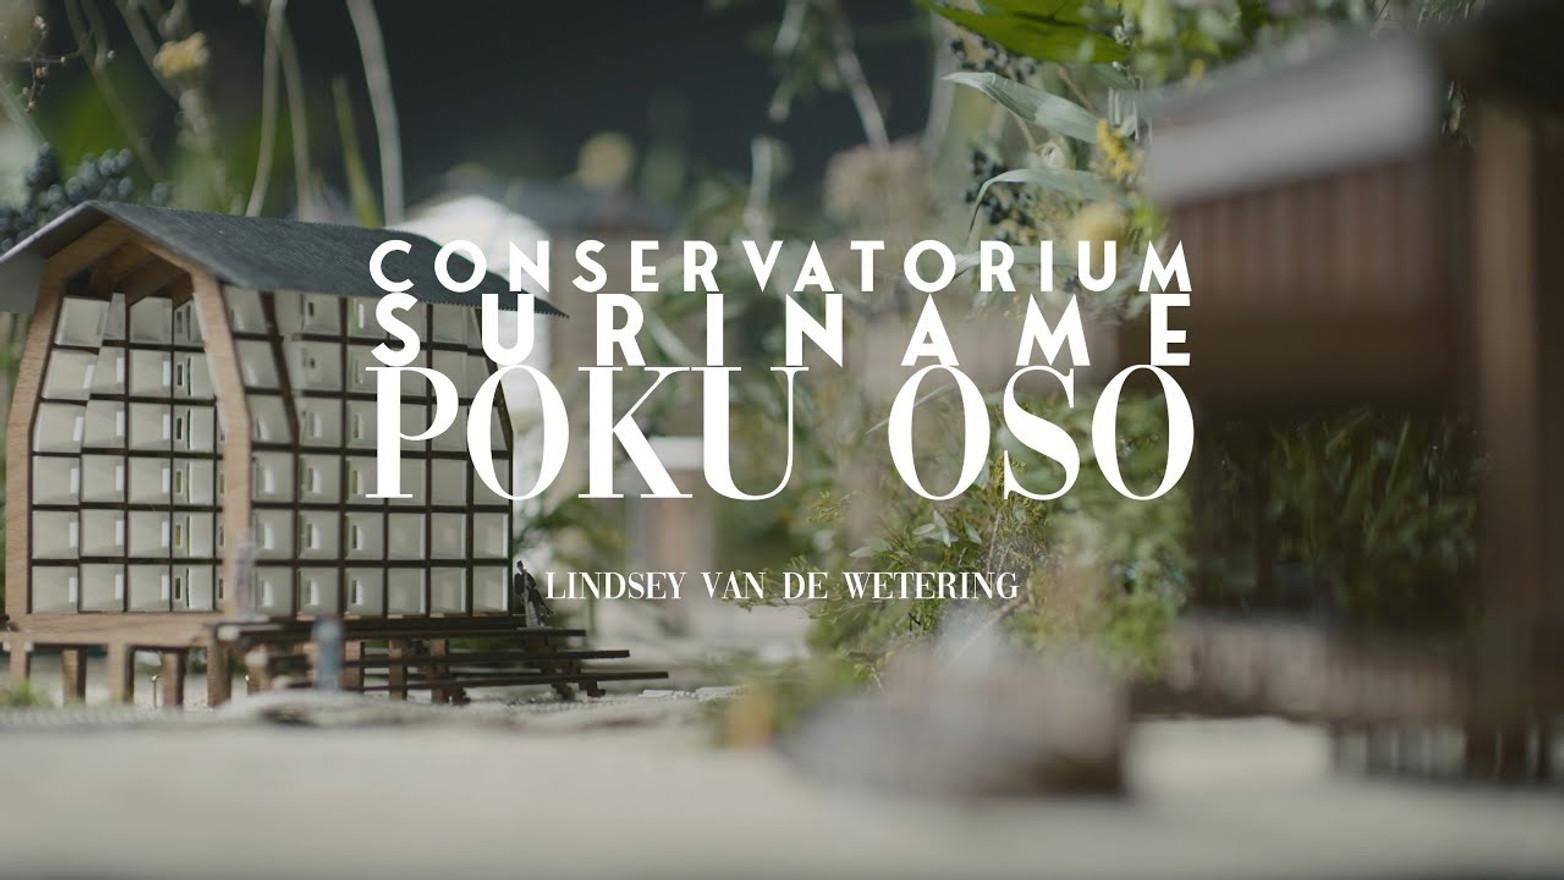 Poku Oso | Een dag in de Cultuurtuin